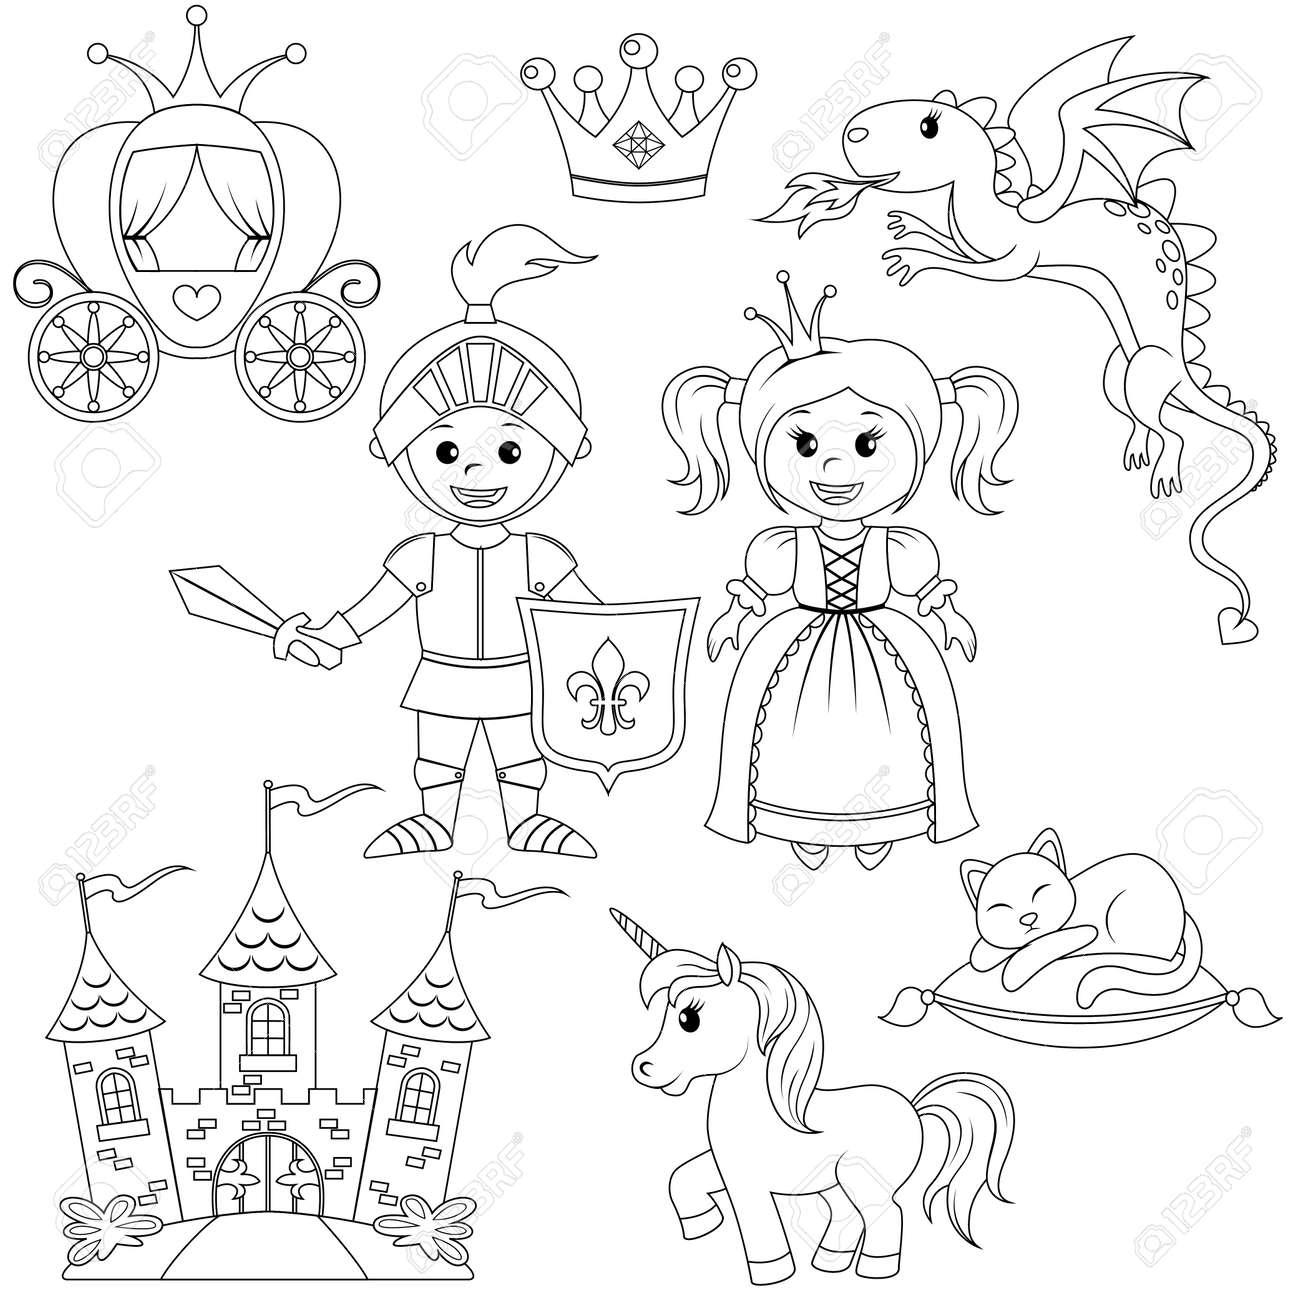 Fairytale Princesse Chevalier Chateau Chariot Licorne Couronne